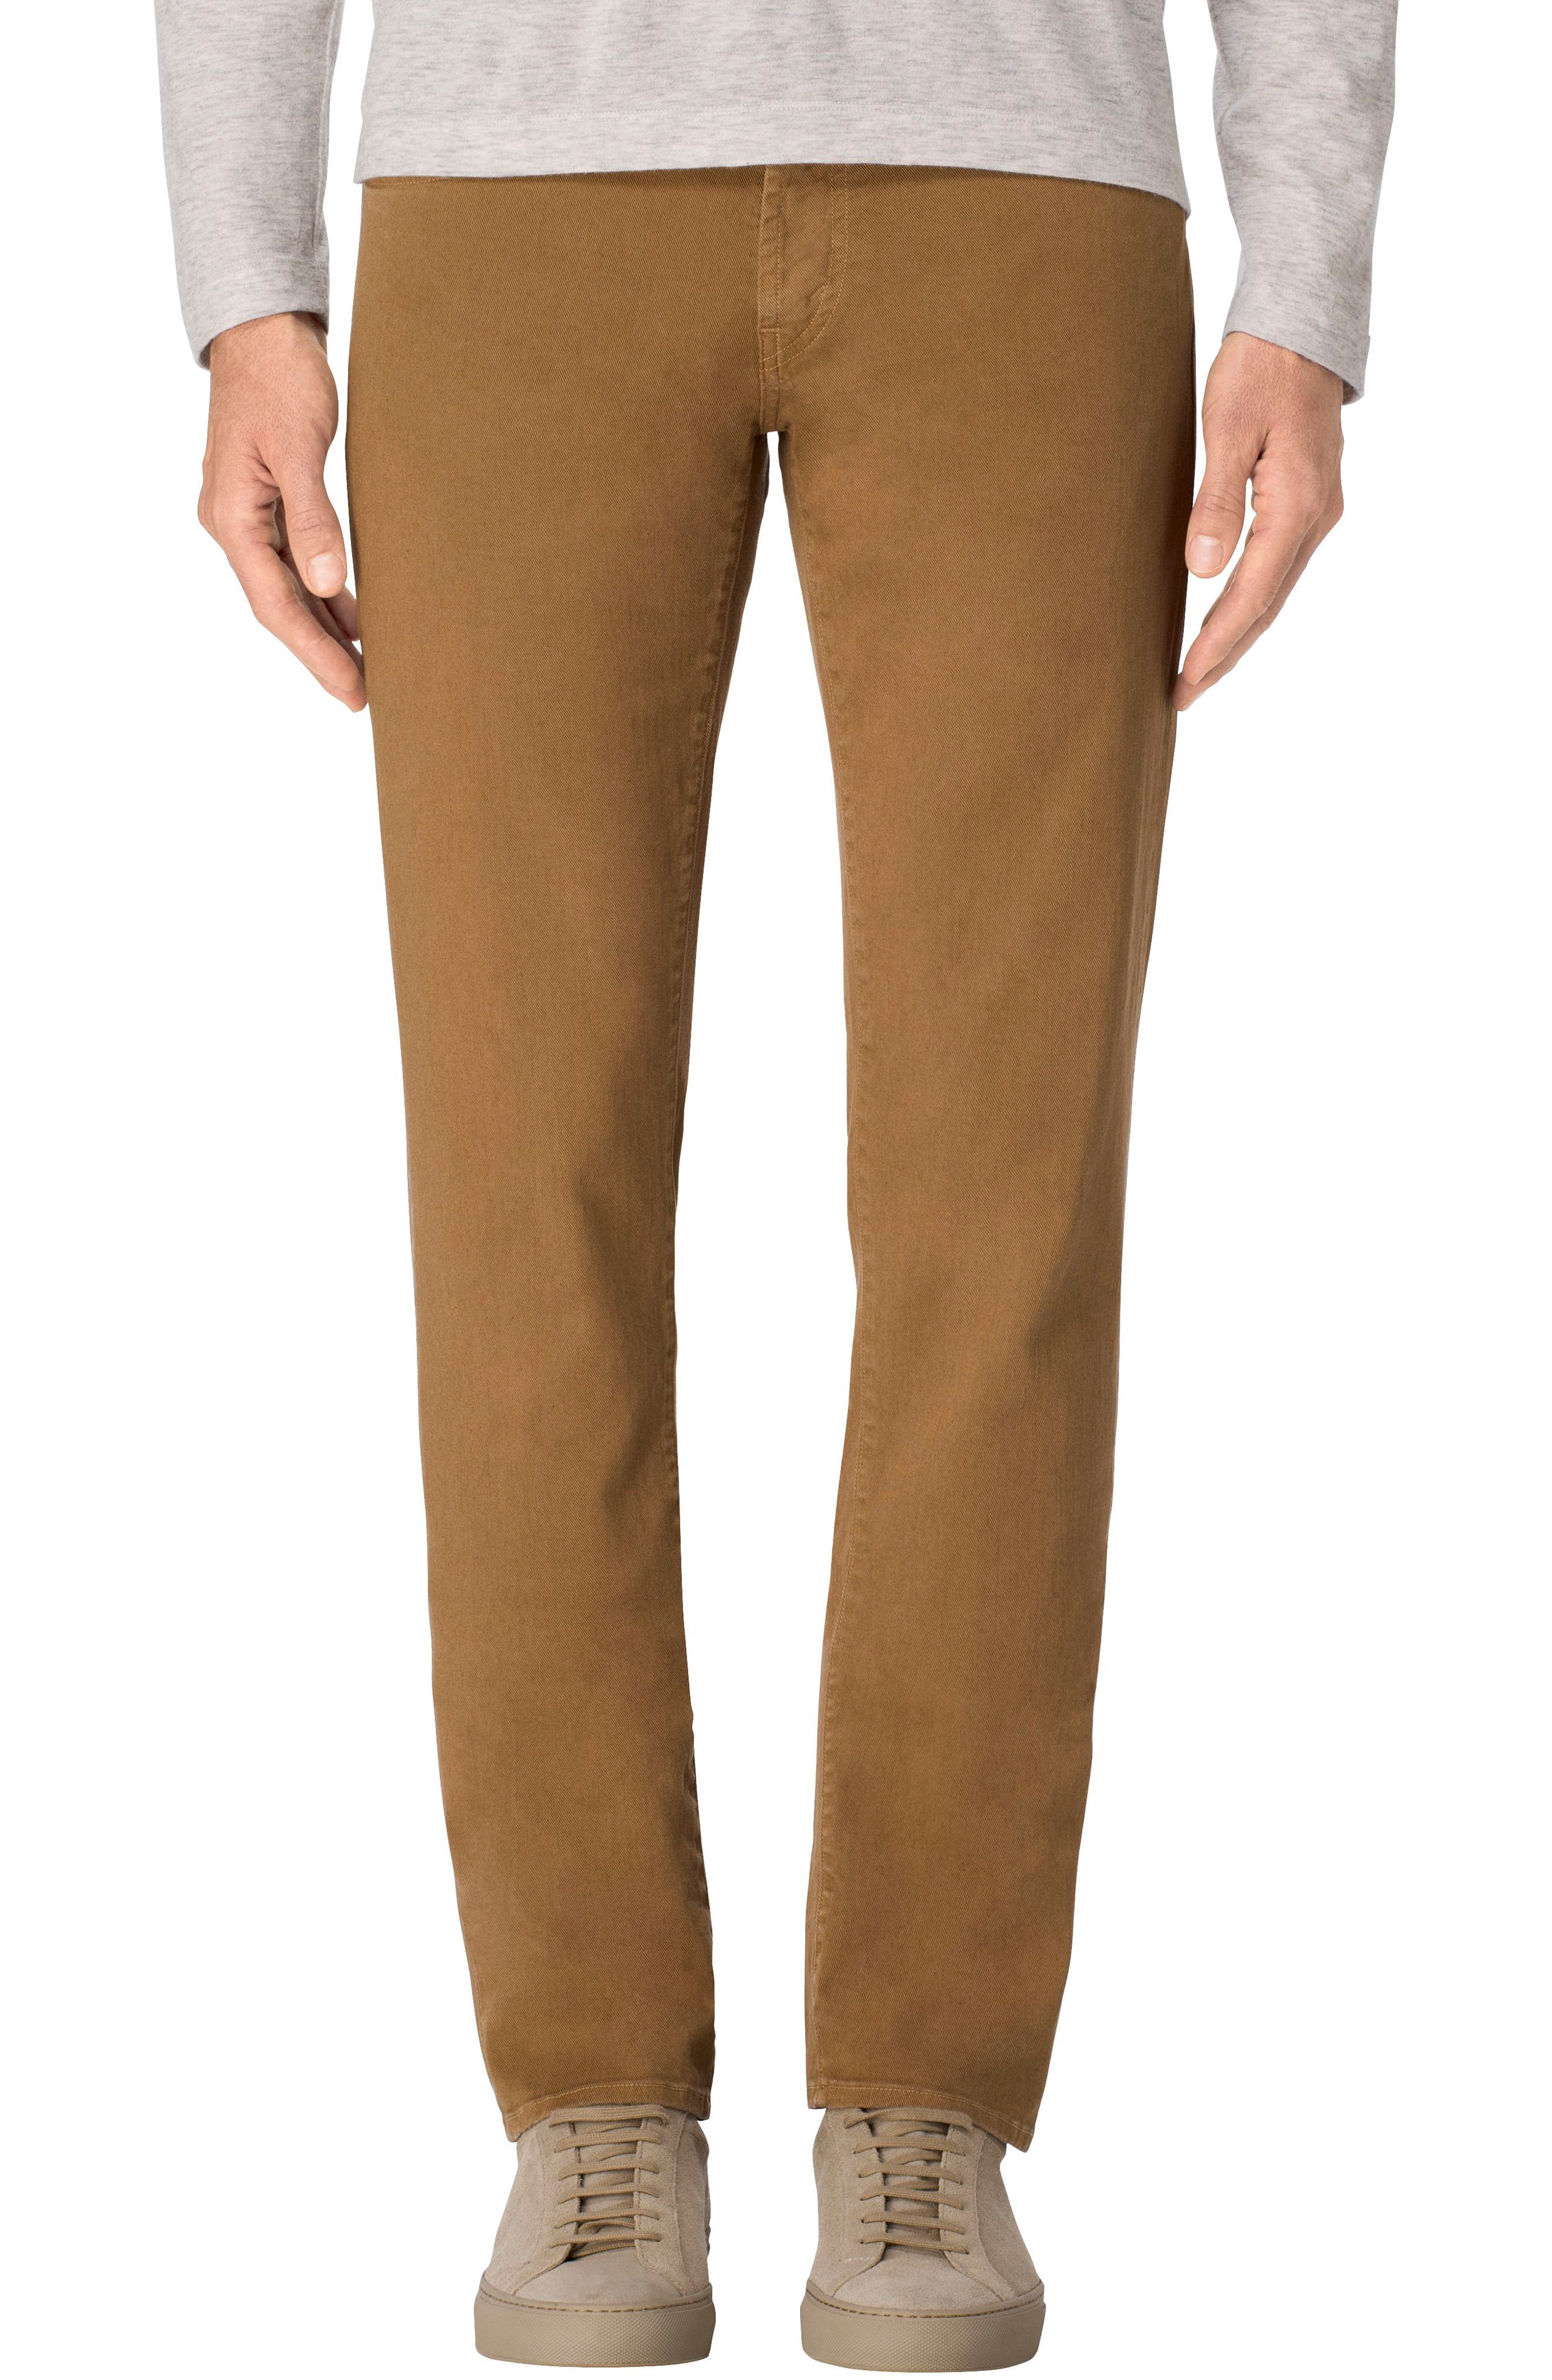 Alternate Image 1 Selected - J Brand Tyler Slim Fit Jeans (Burner)